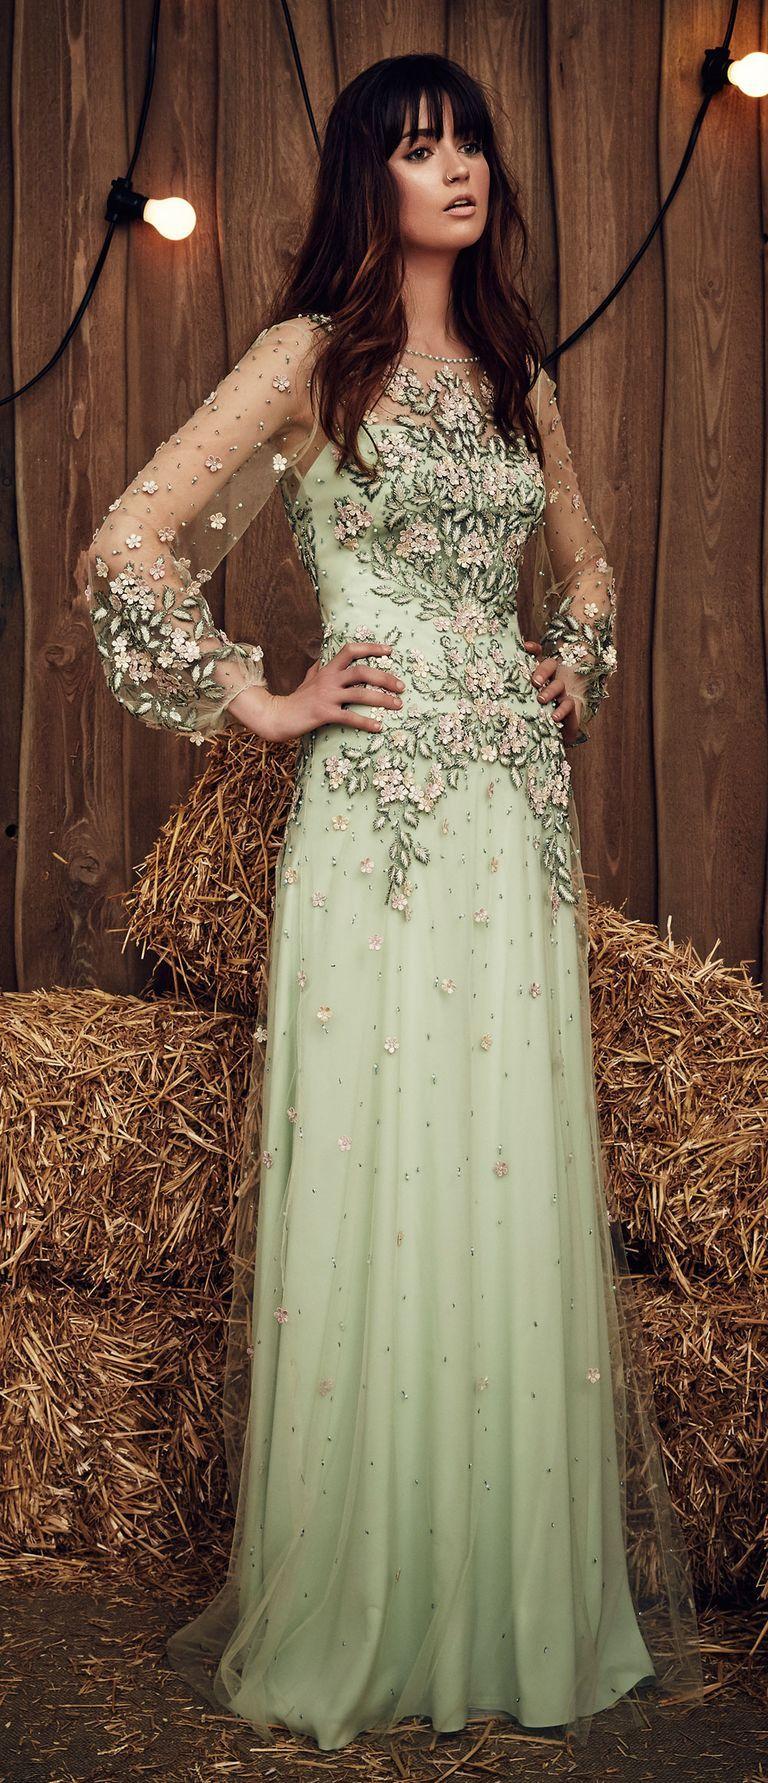 Celadon Green Hits the Runway at Jenny Packham\'s Gypsy-Inspired ...